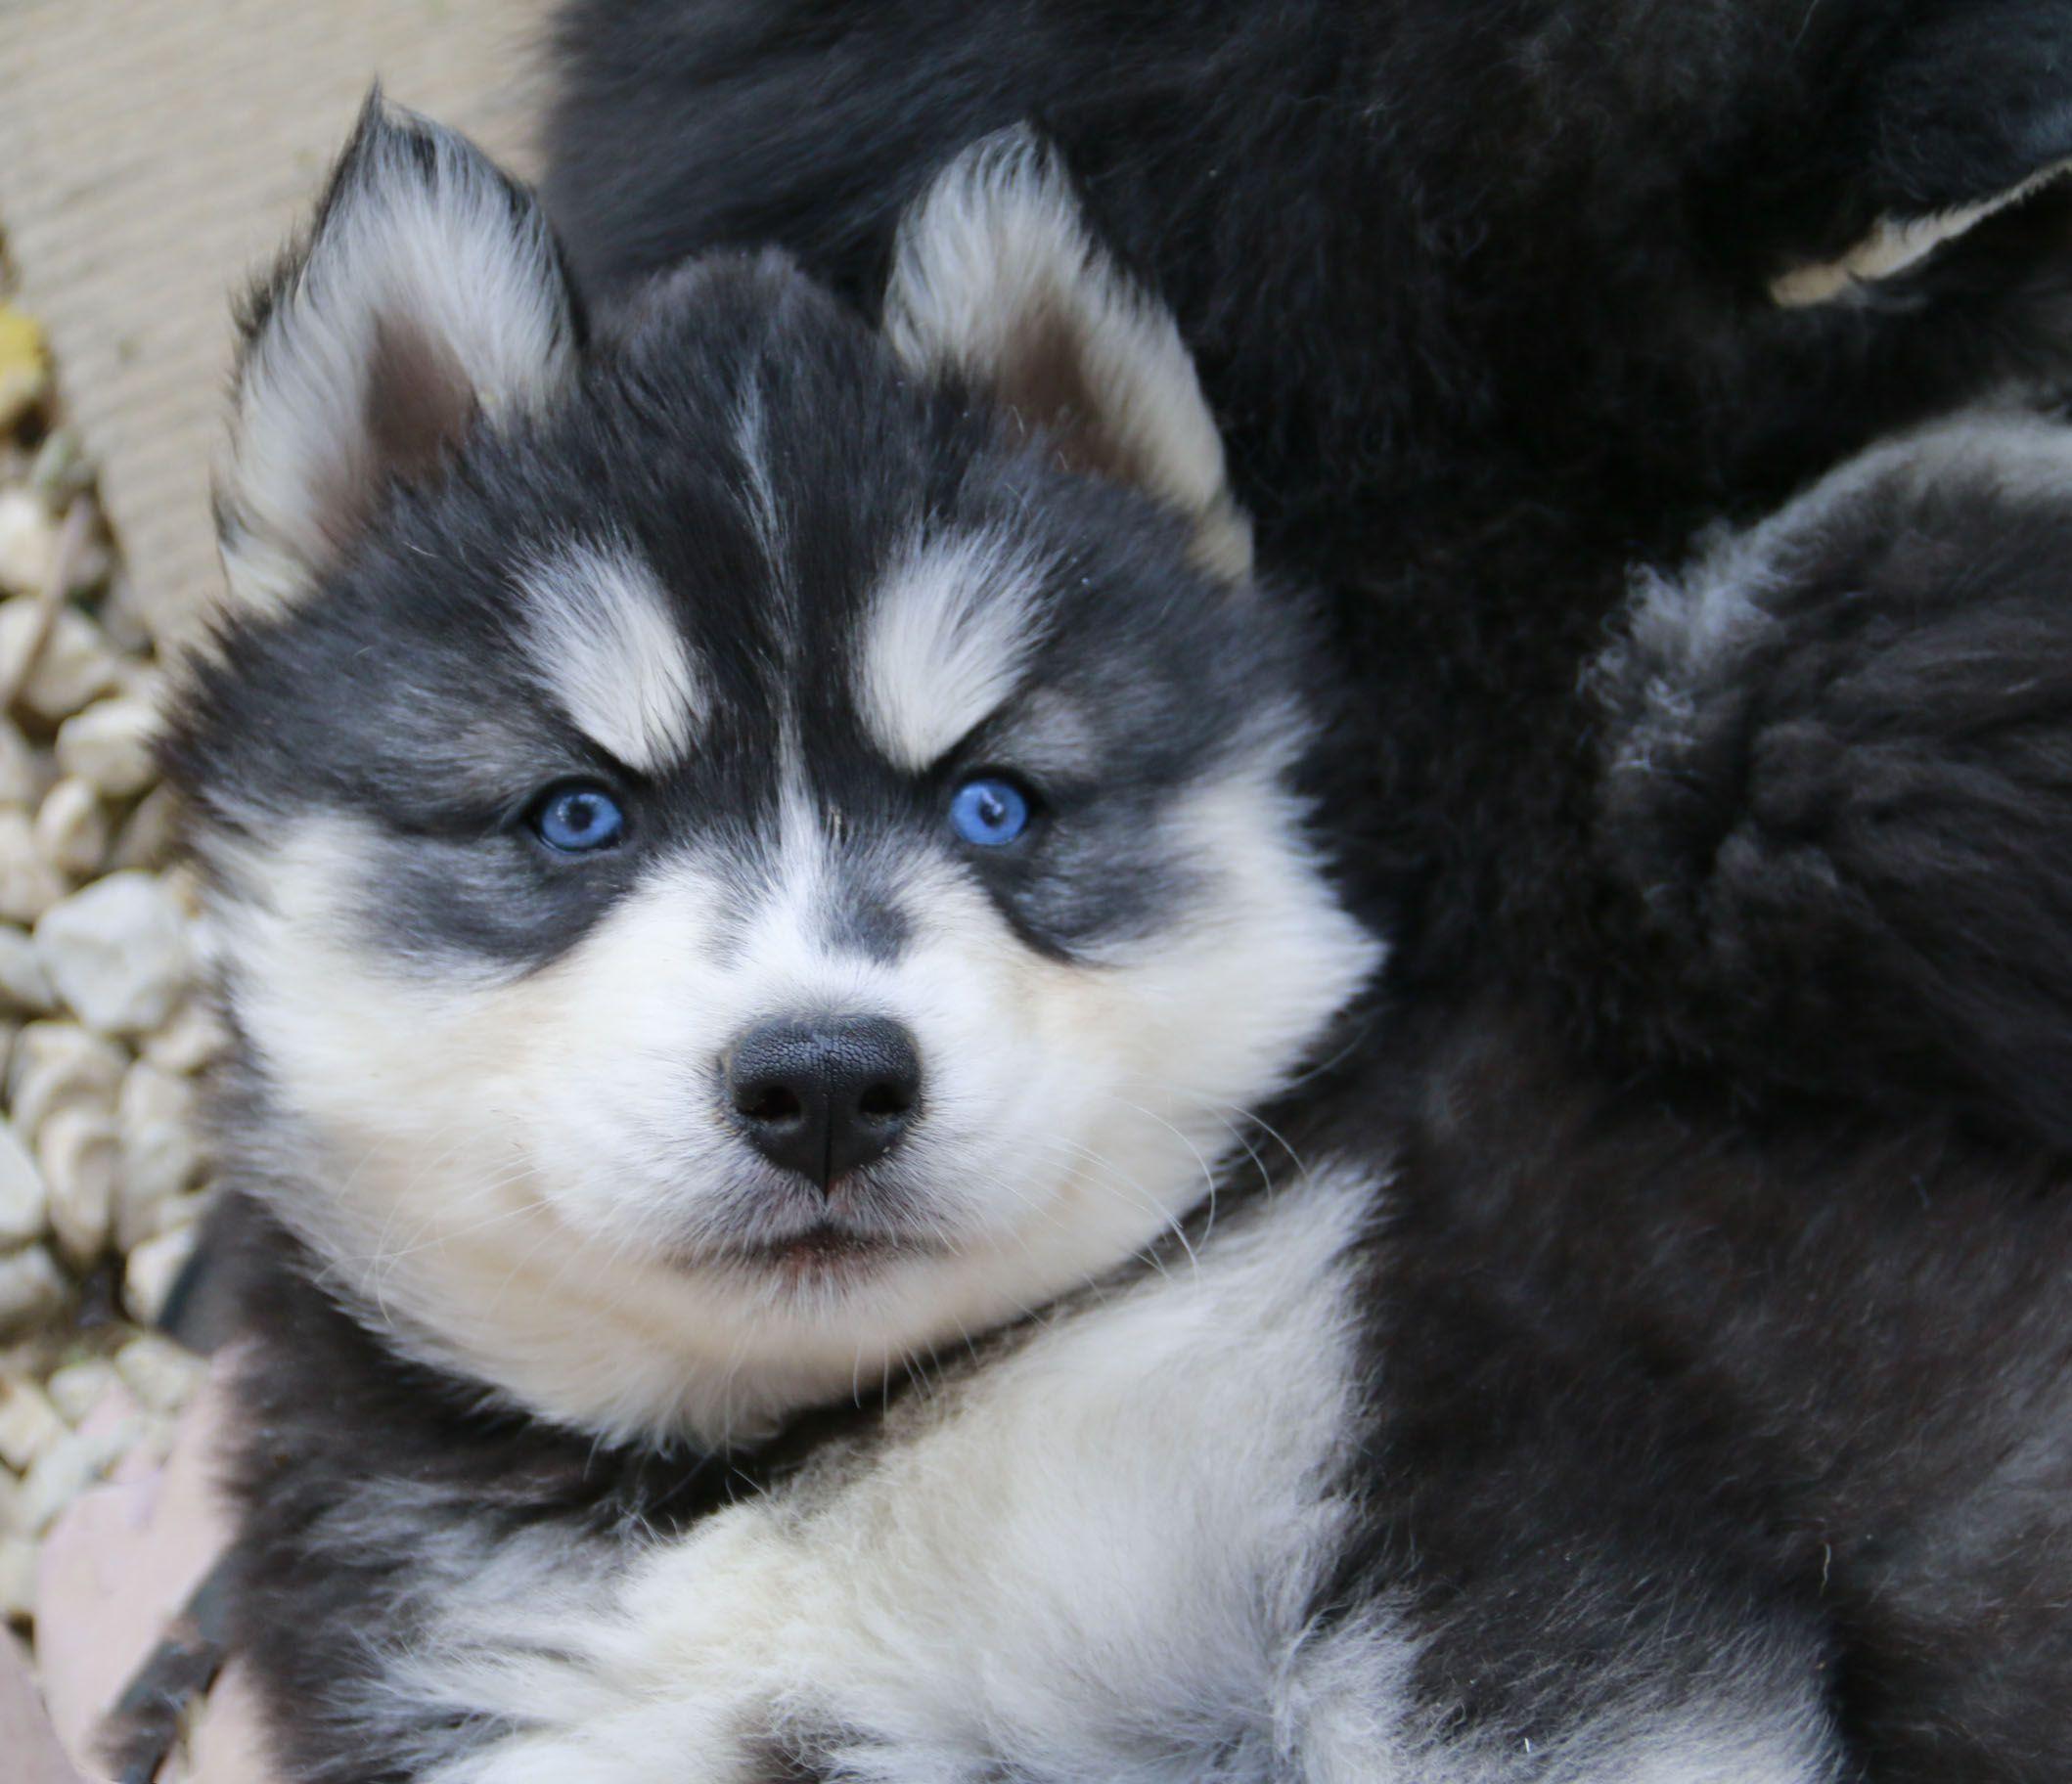 Cute Adorable Husky Puppy Siberianhusky Texashuskies Huskies Pets Dogs Blueeyes Beautiful Siberian Husky Husky Husky Puppy